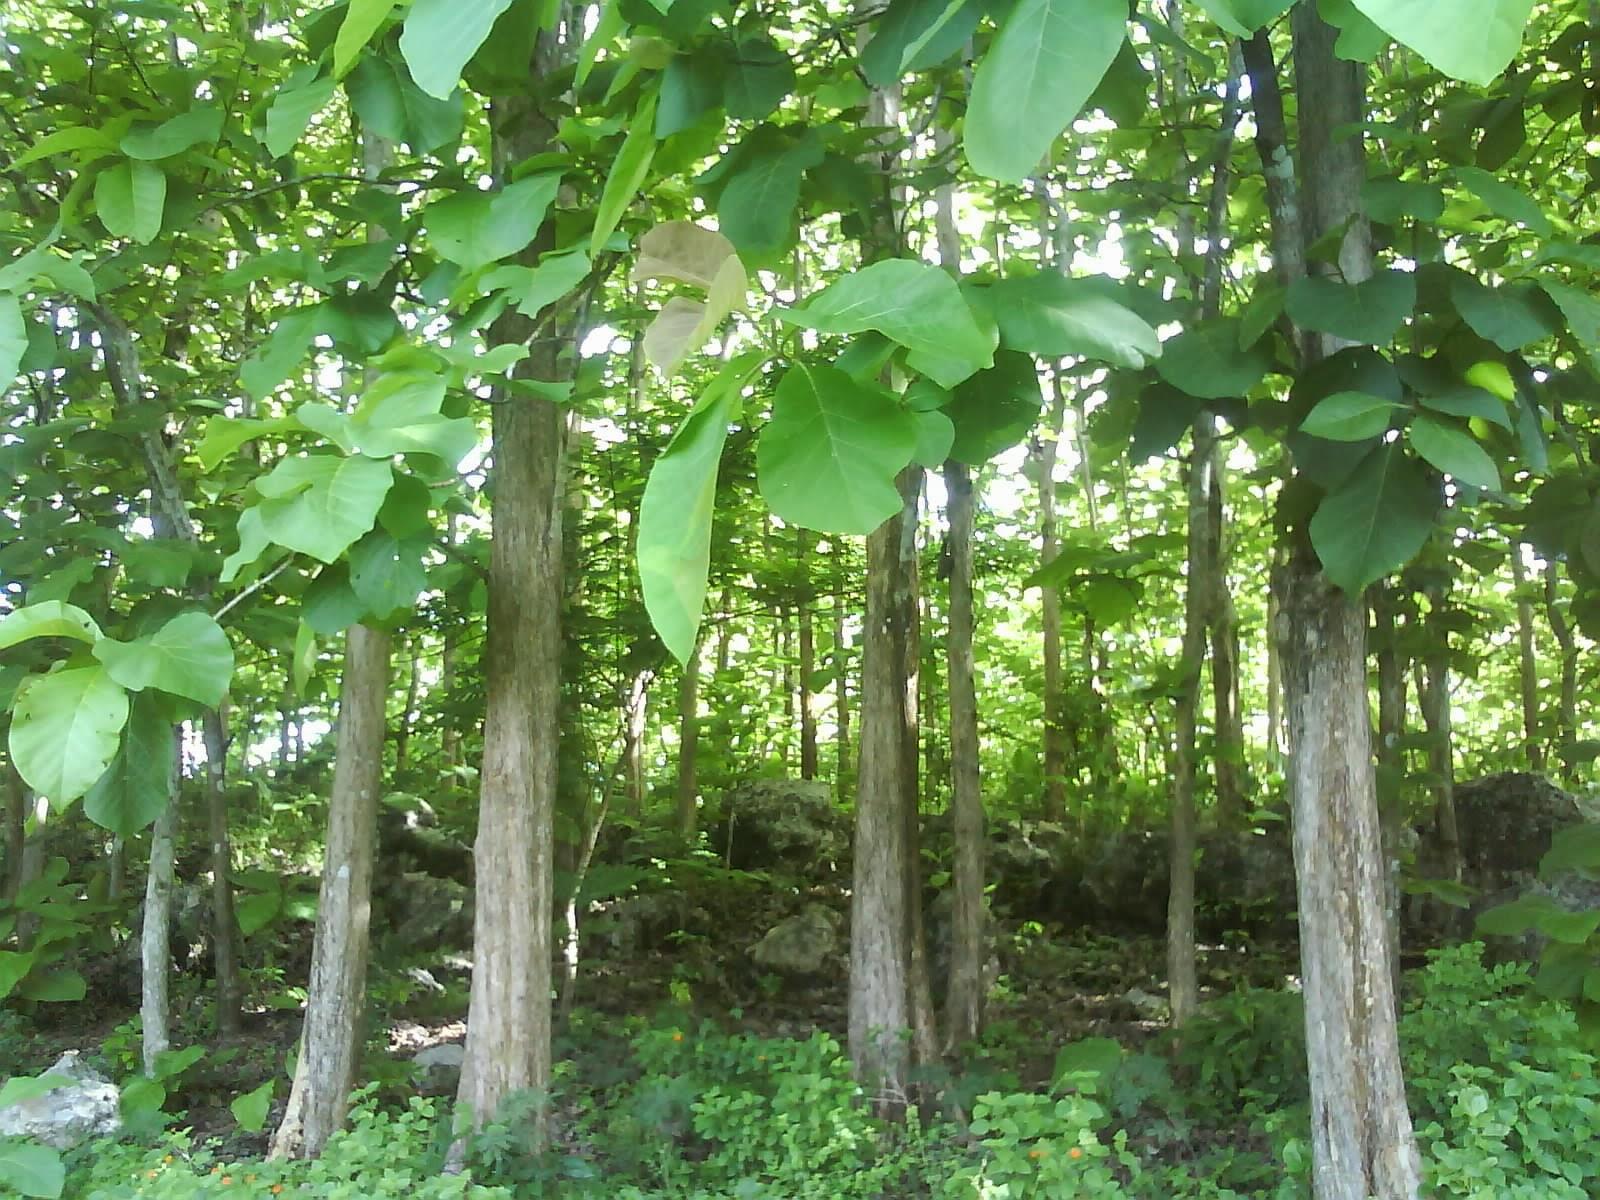 Pohon jati, contoh tanaman sandang yang berasal dari batangnya.